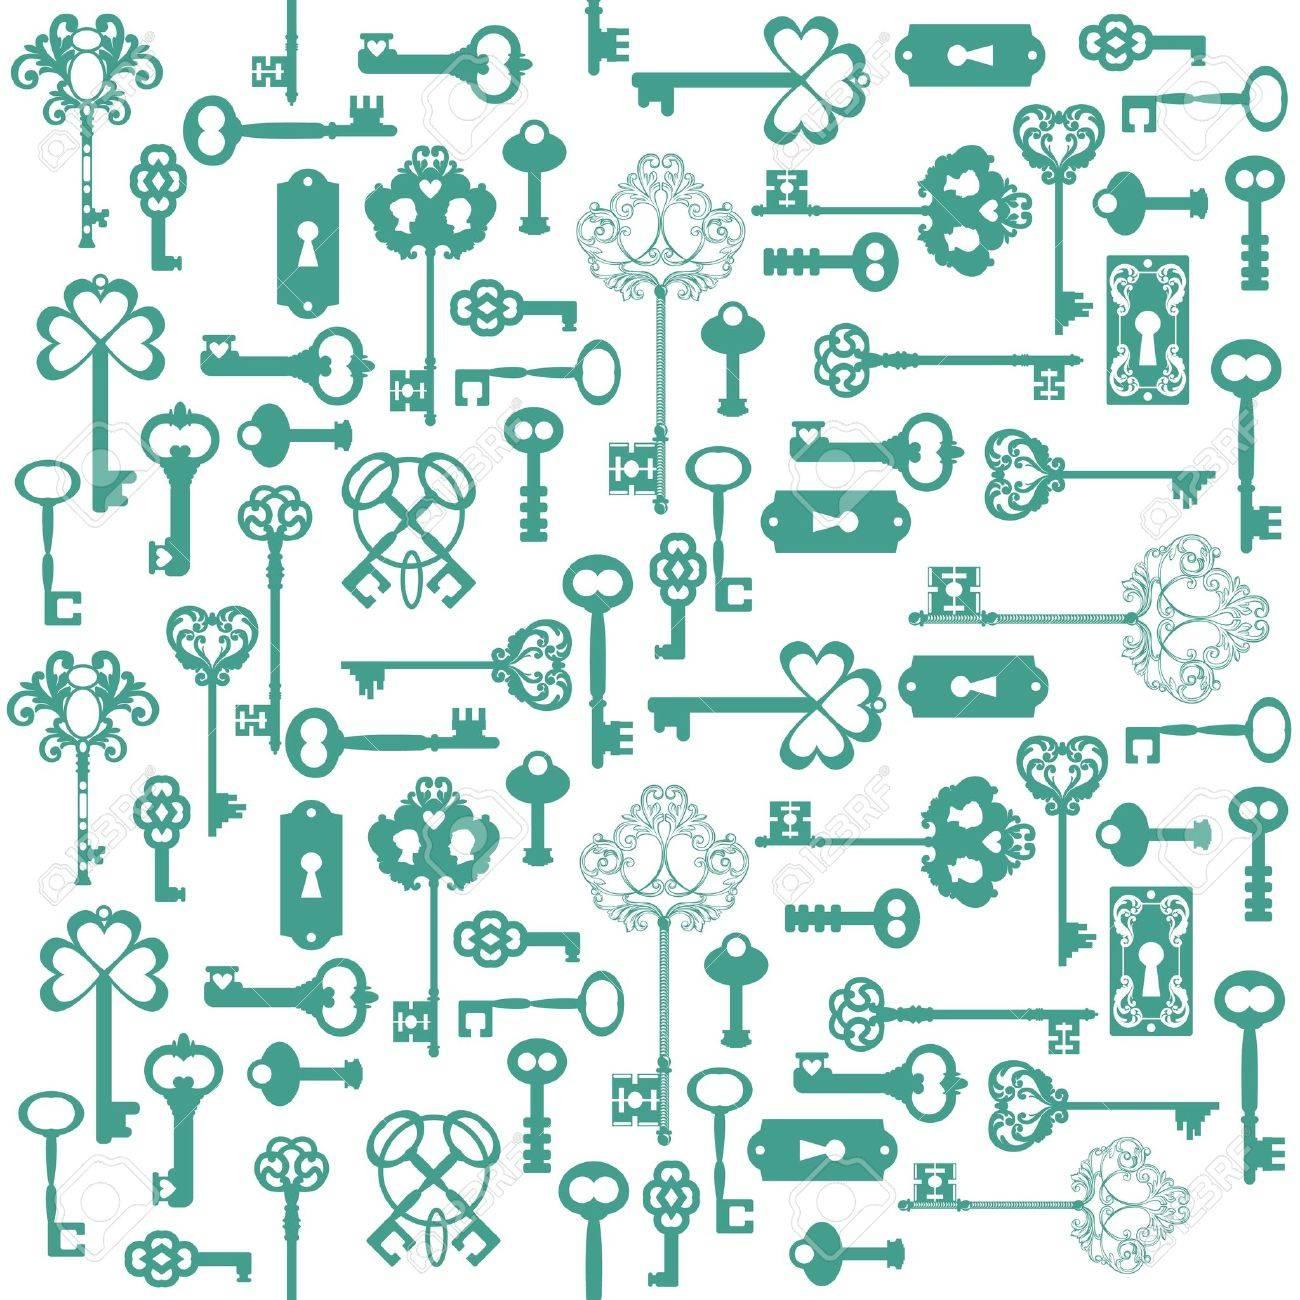 Antique Keys Background - for your design or scrapbook - Stock Vector - 15356320